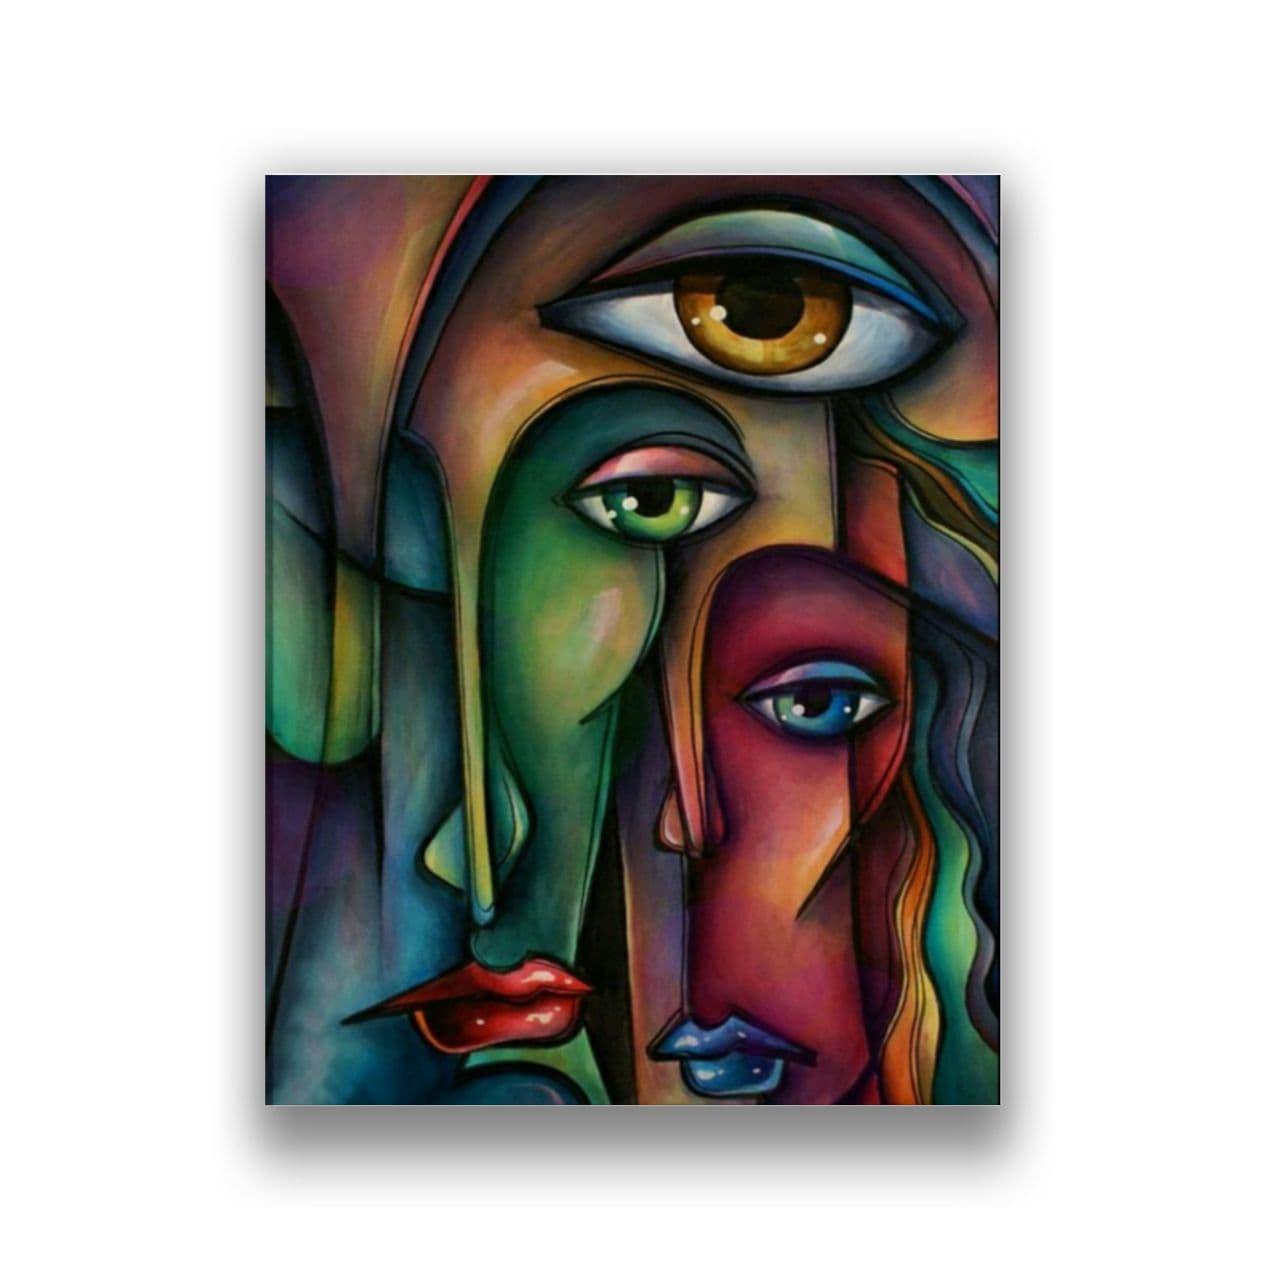 Aztec one eyed faces1